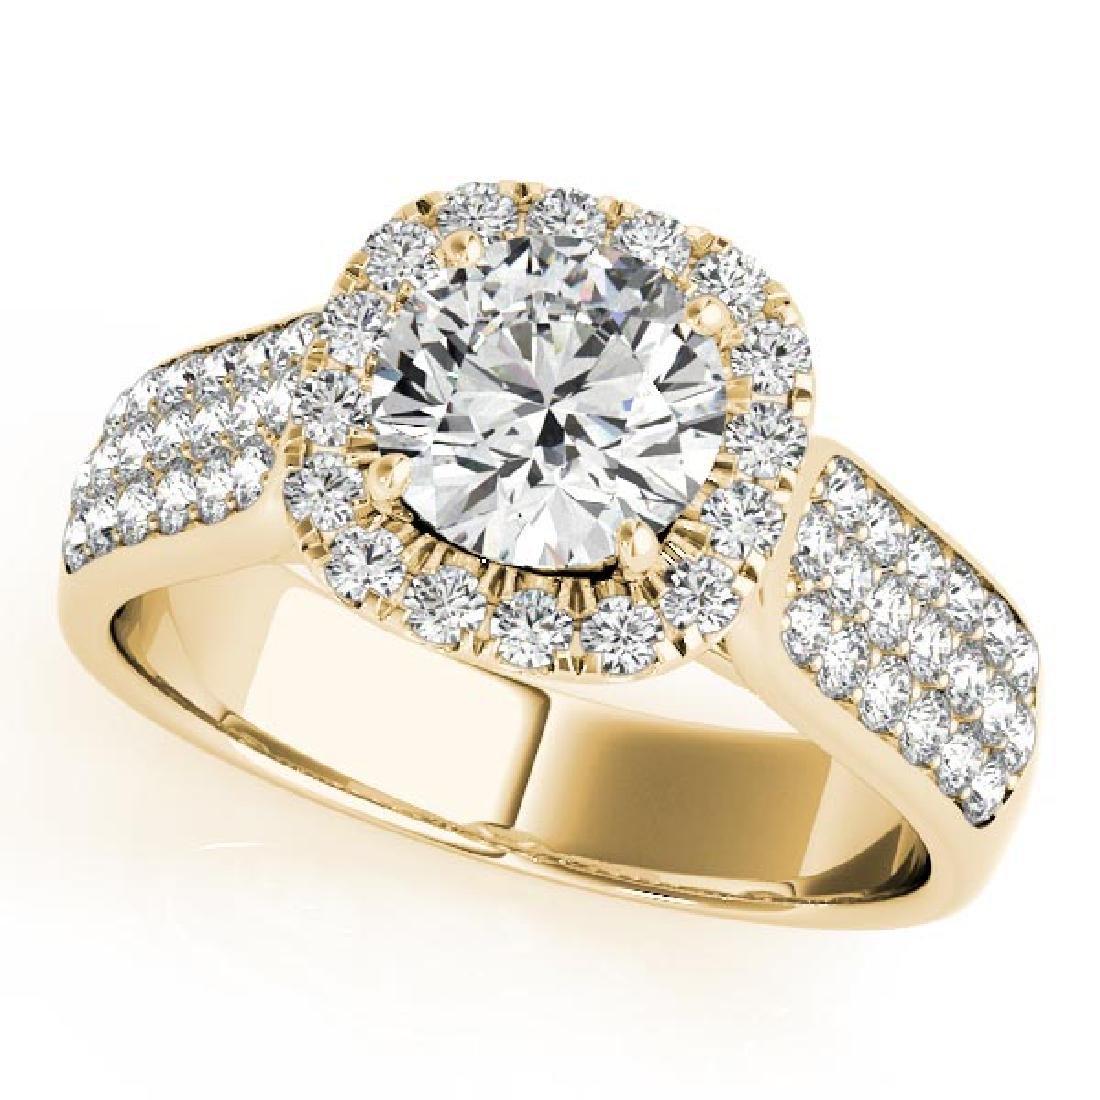 CERTIFIED 18K YELLOW GOLD 1.40 CT G-H/VS-SI1 DIAMOND HA